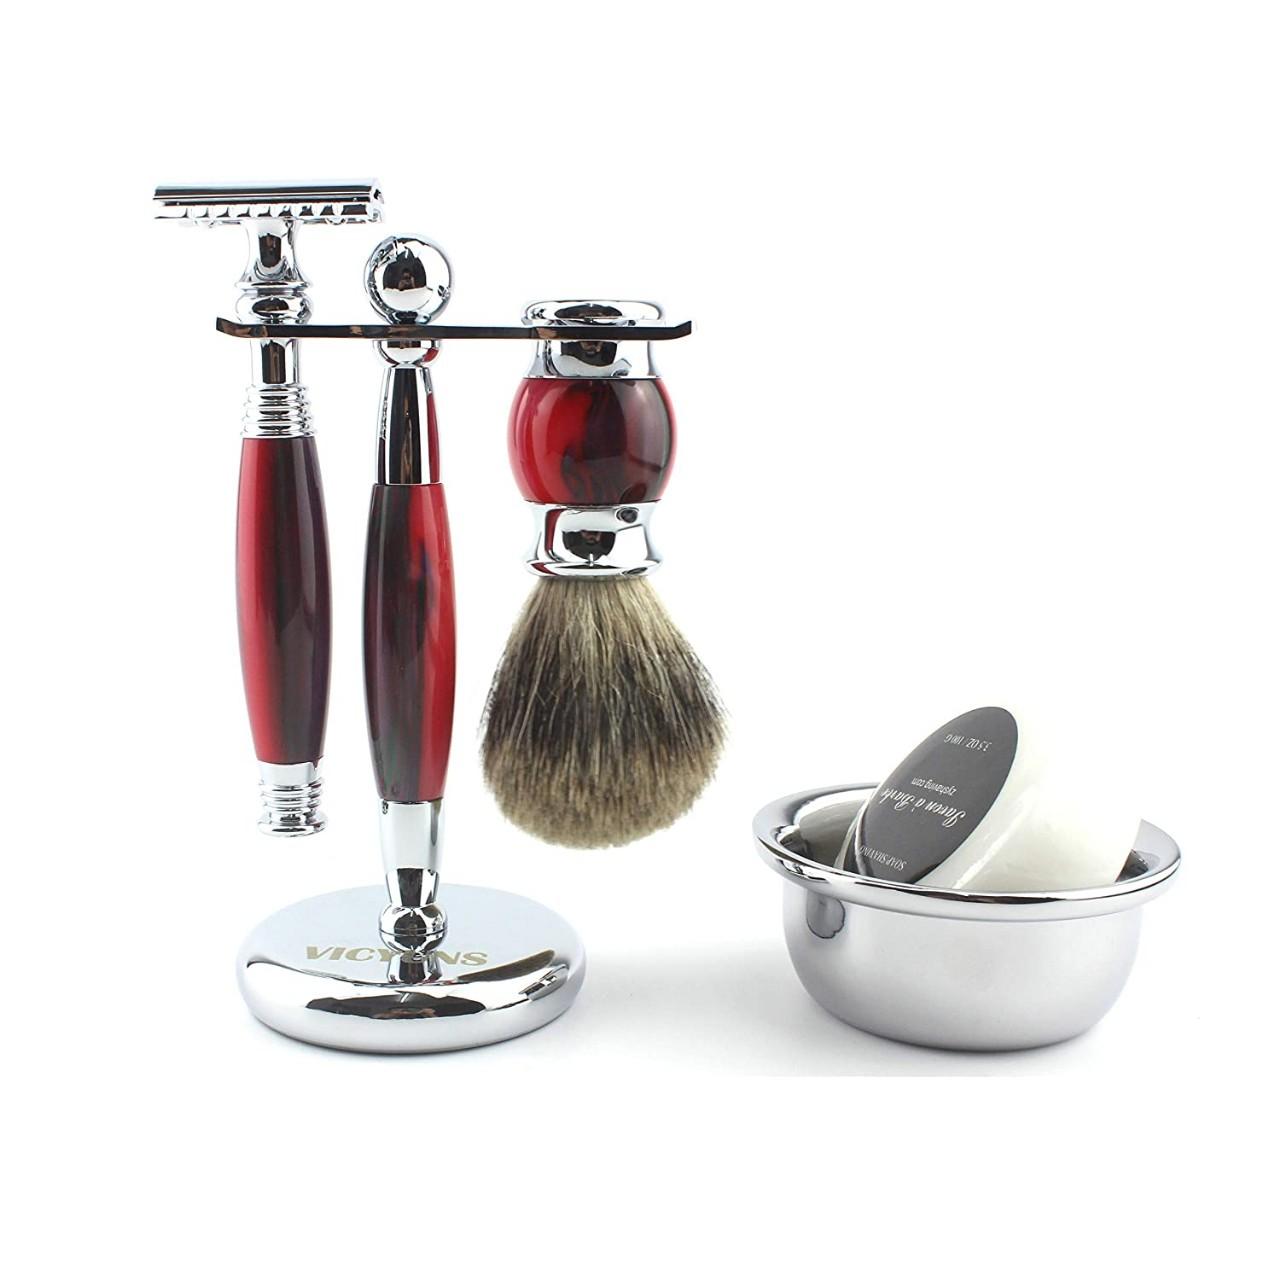 VICYUNS Luxury Grooming Shaving Set for Men Including Double-sided Razor, Allergy Shaving Soap